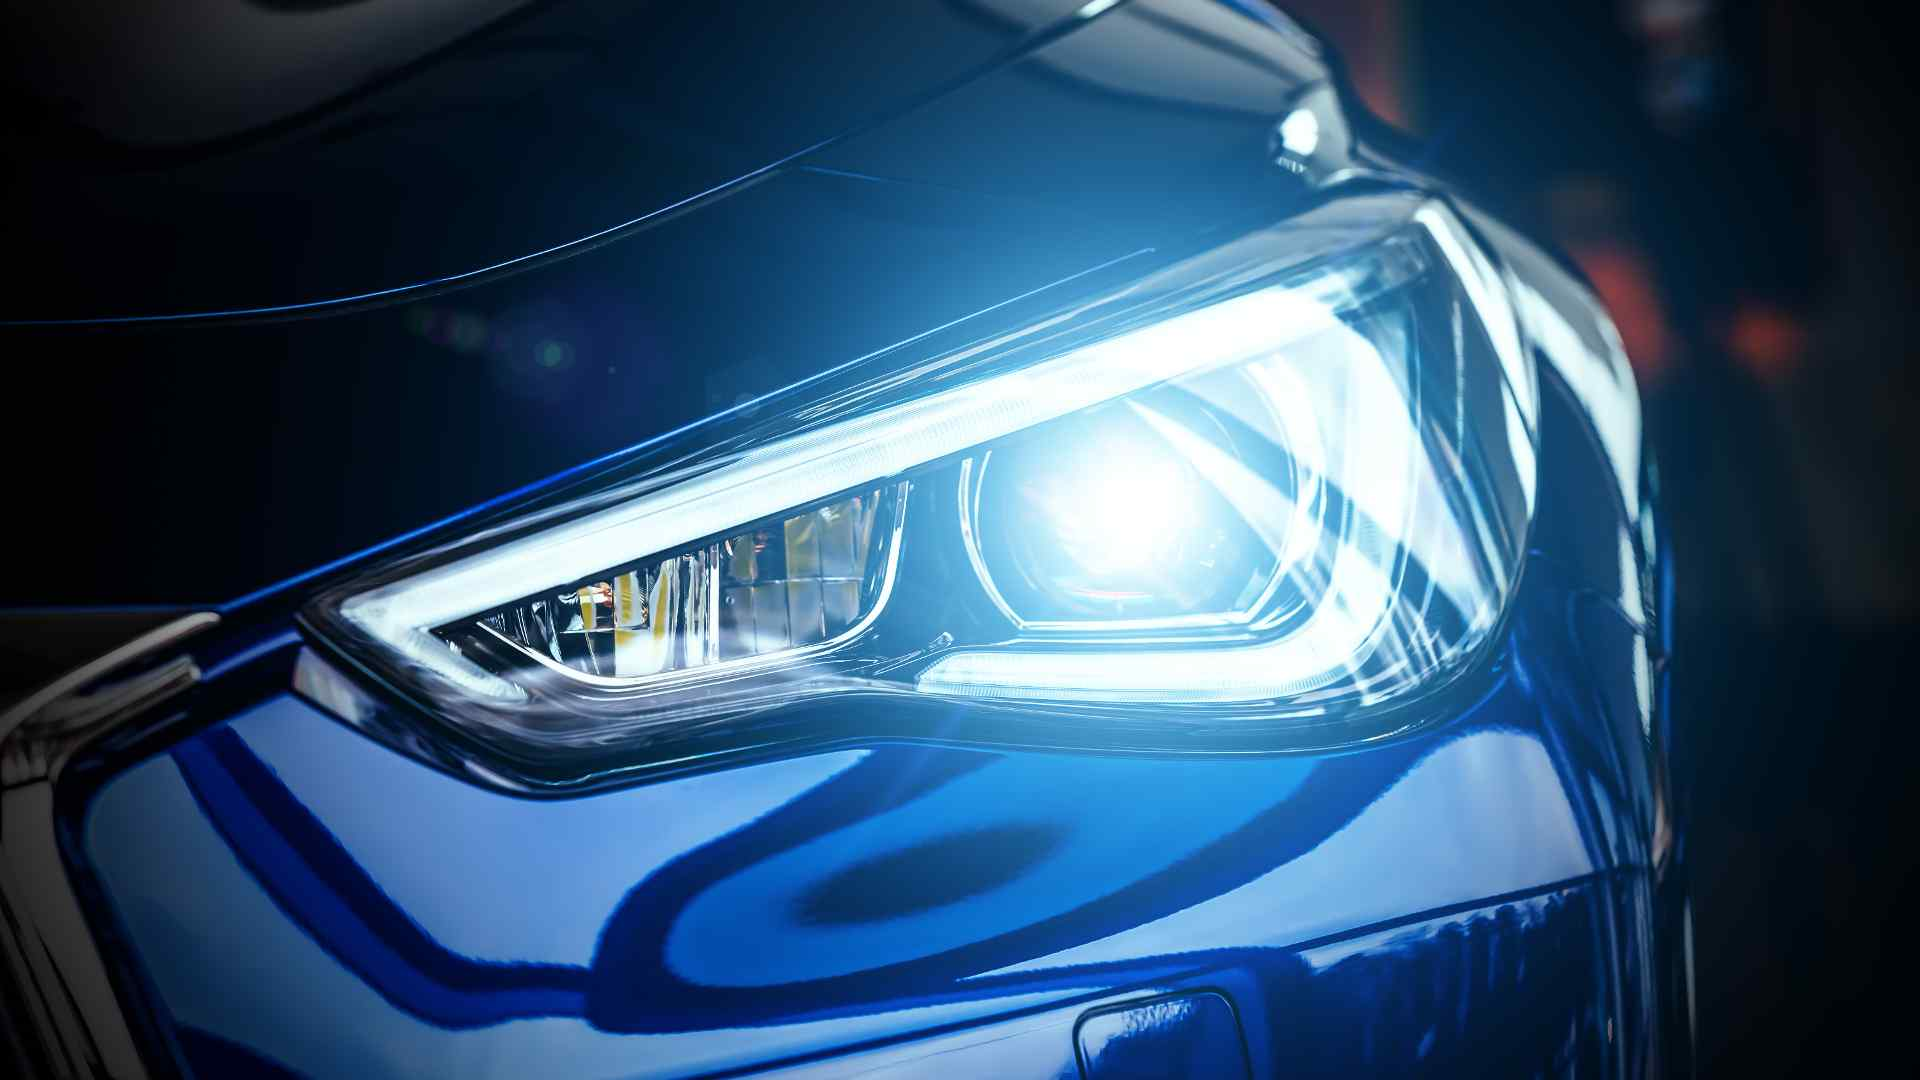 LED vs Halogen Headlights 2